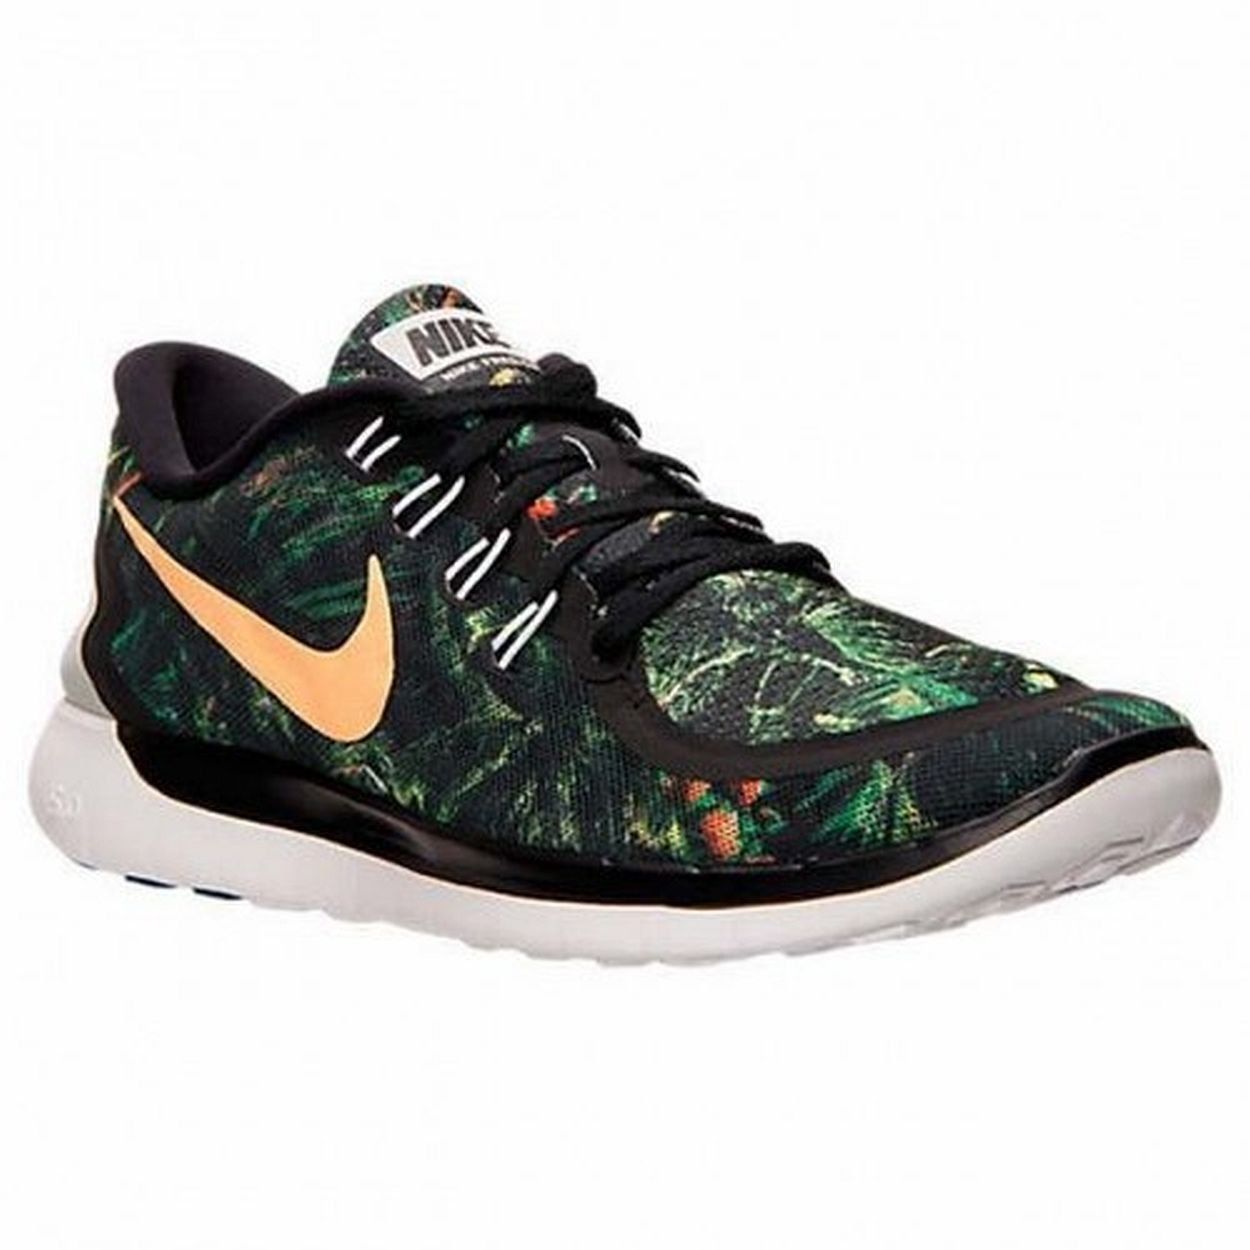 ffc4539b55127 Nike Men s Free 5.0 Solstice Running Shoes